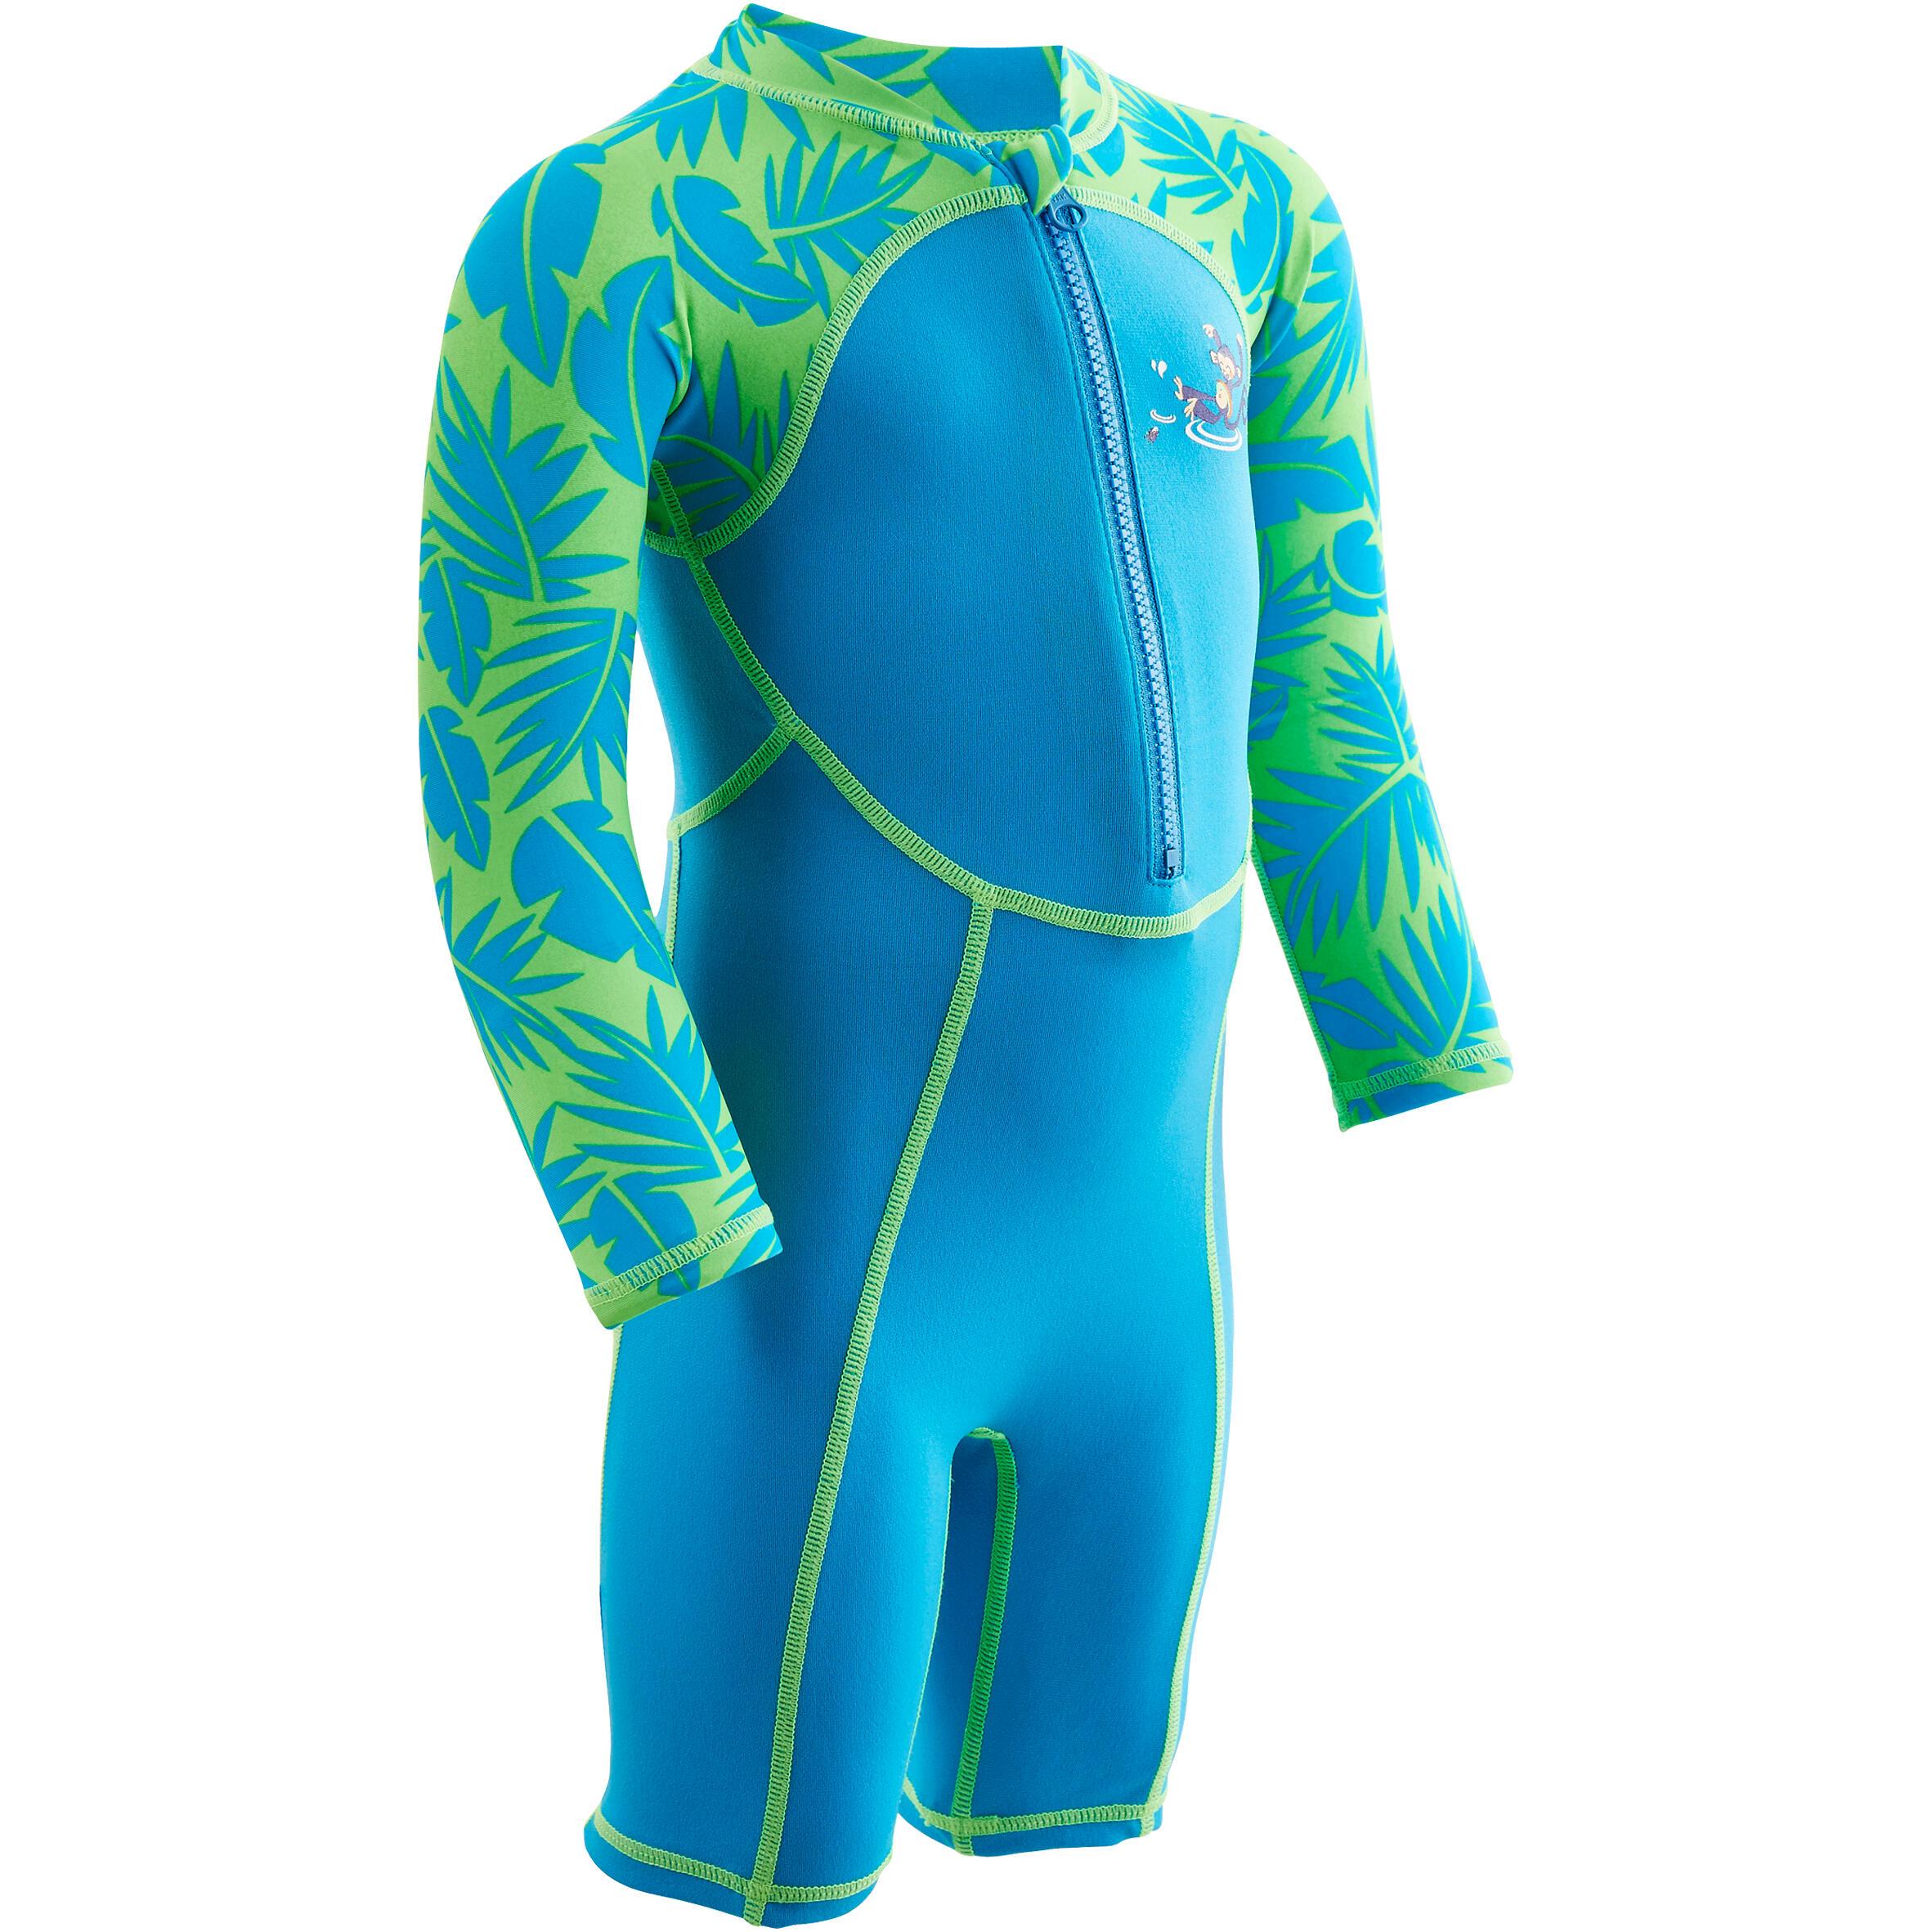 5cda03516f2e18 Zwemkleding kopen? | Decathlon.nl